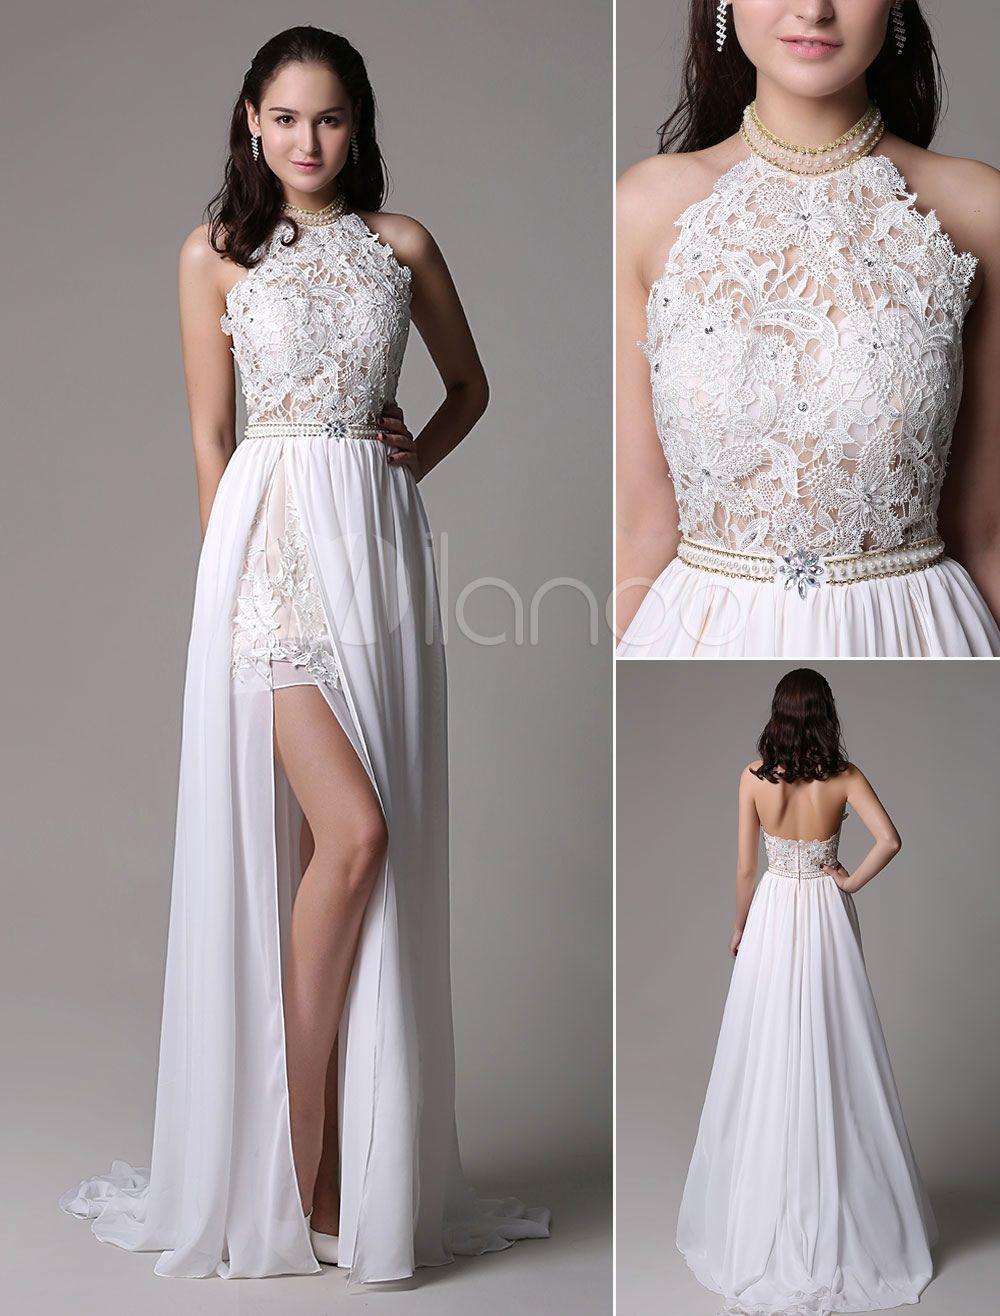 Top Abendkleid Weiß Lang Spitze Vertrieb Coolste Abendkleid Weiß Lang Spitze Stylish